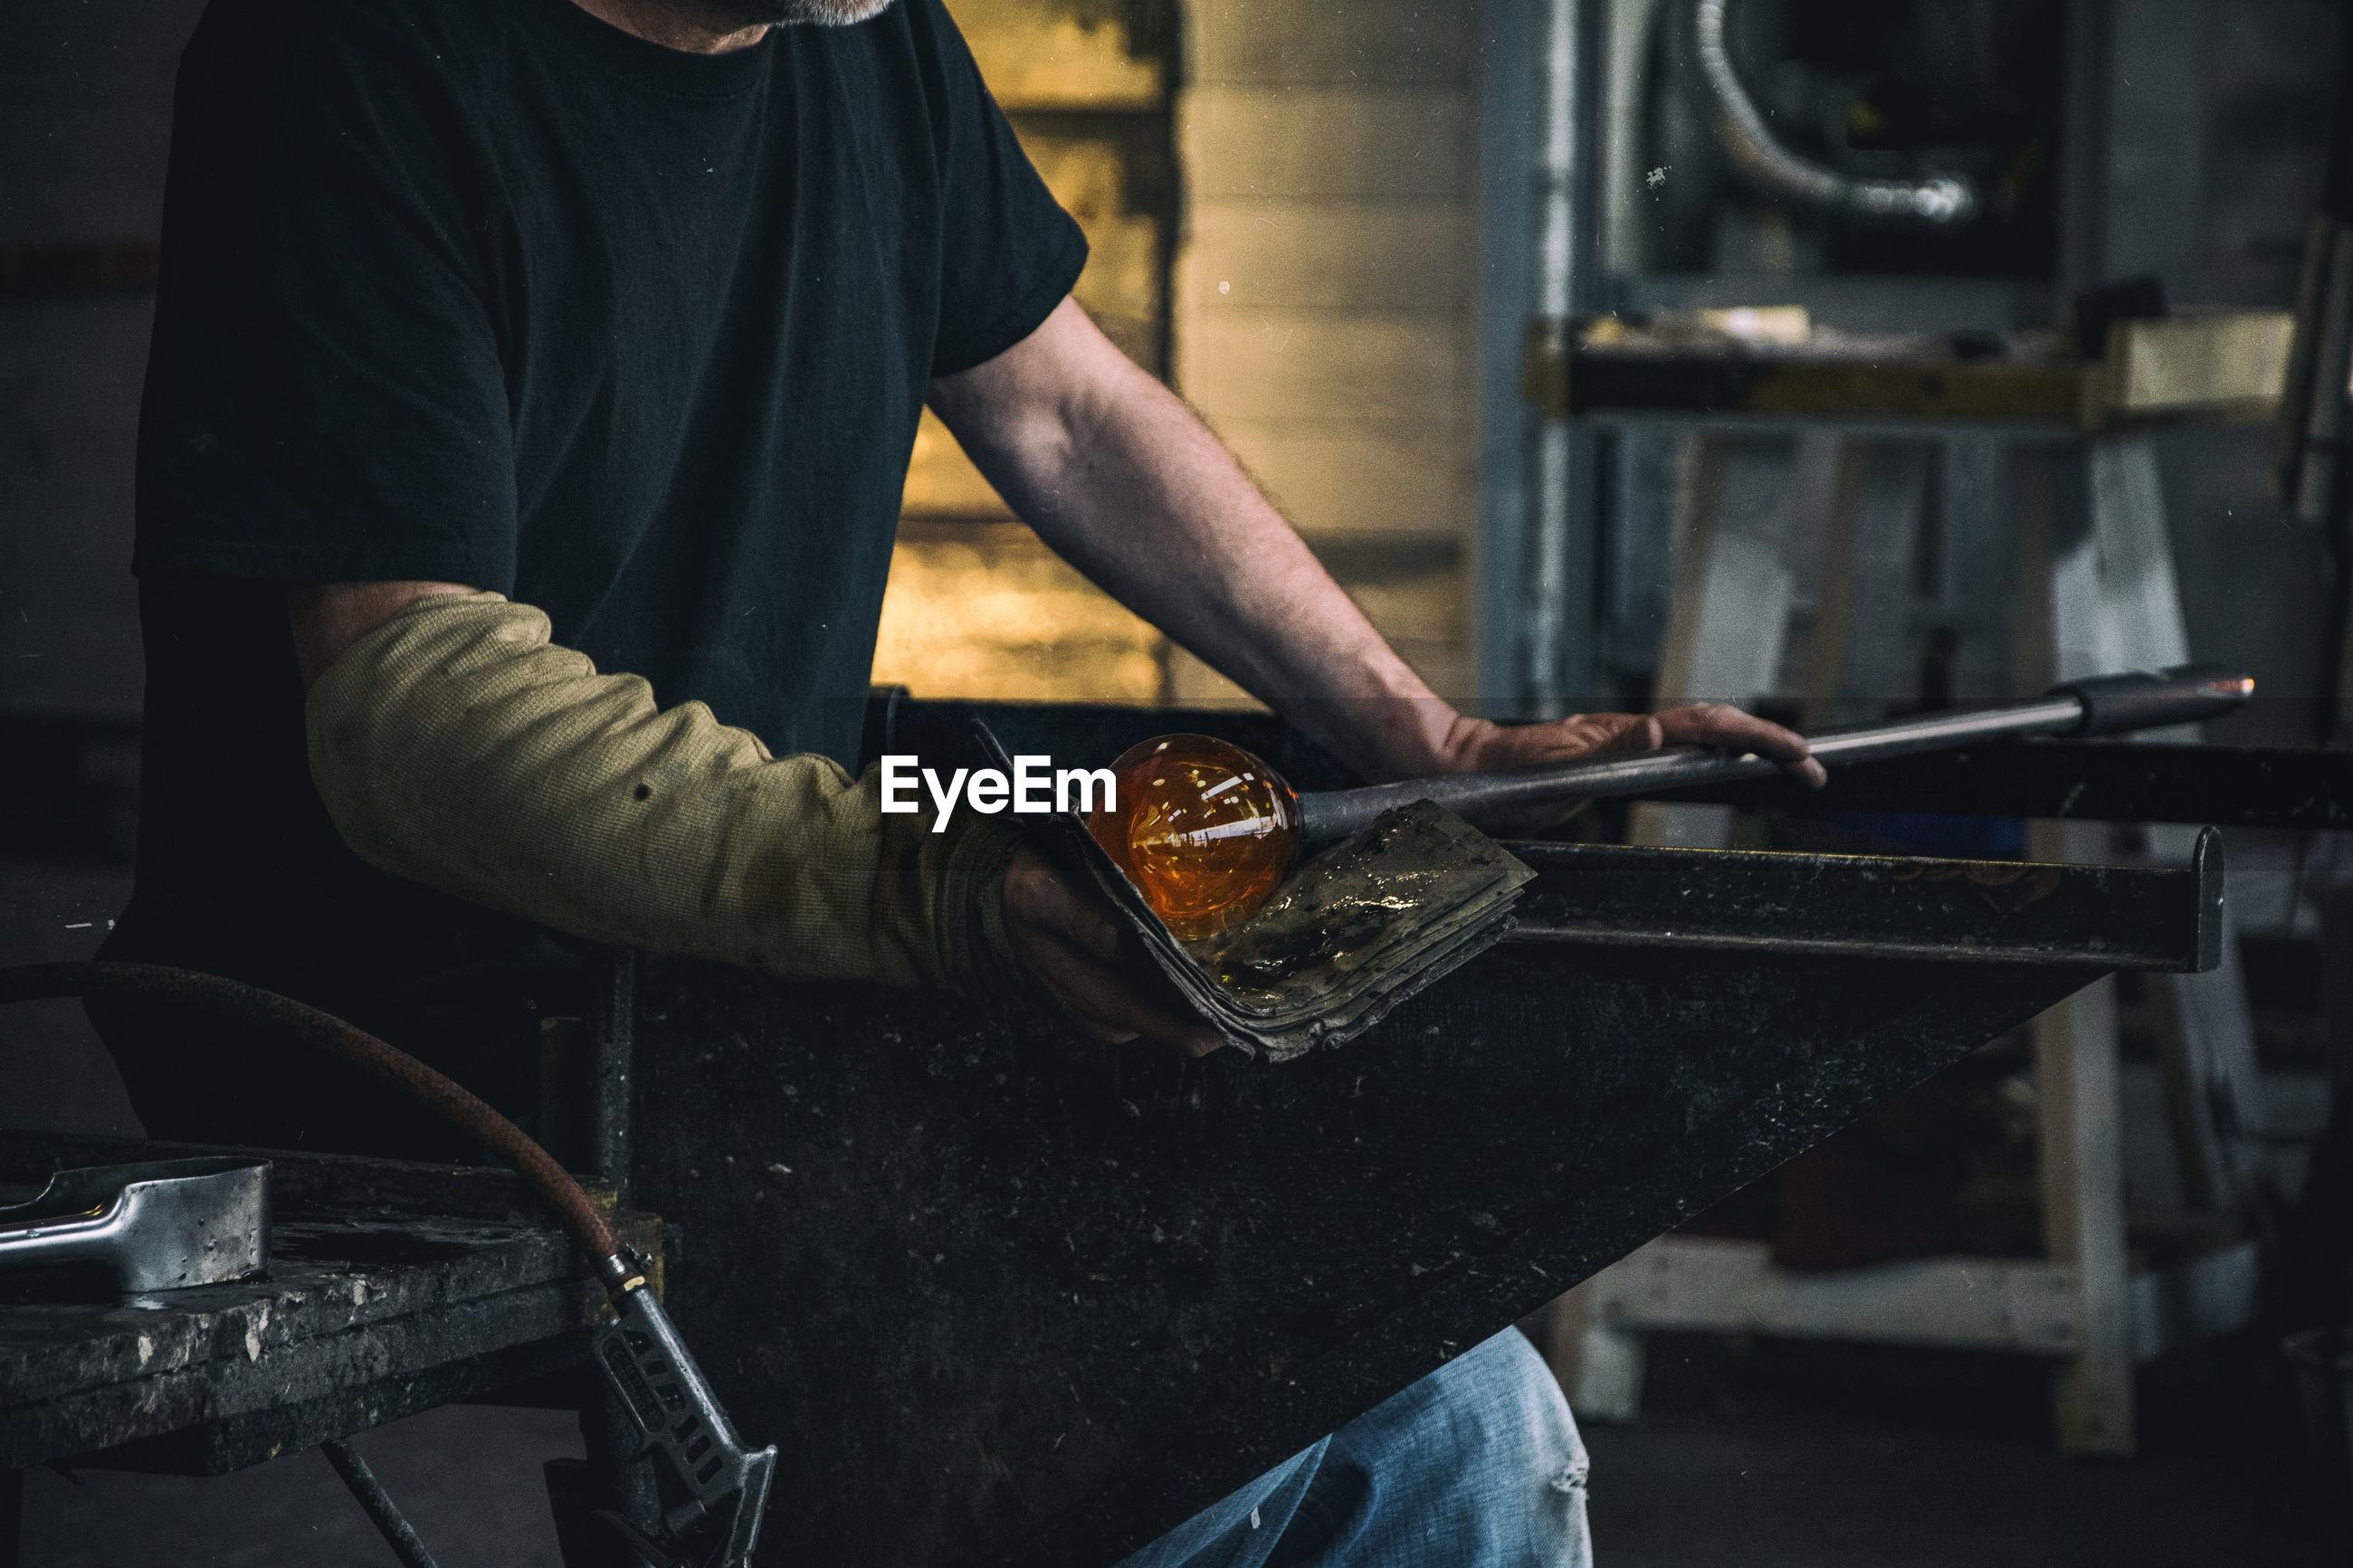 Man working on glassware